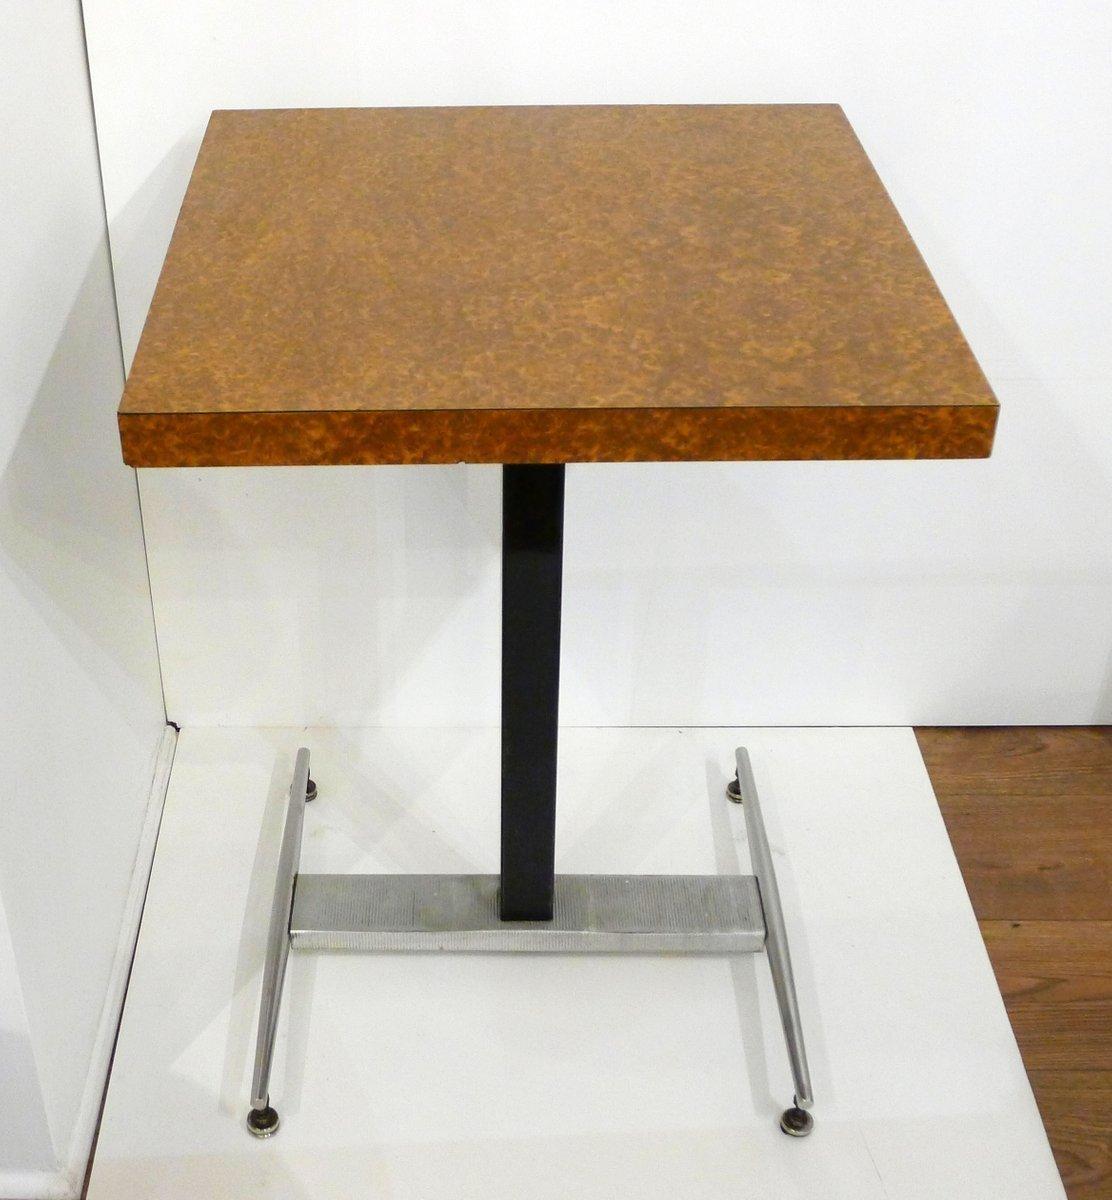 Image of: Mid Century Square Bistro Table Vinterior